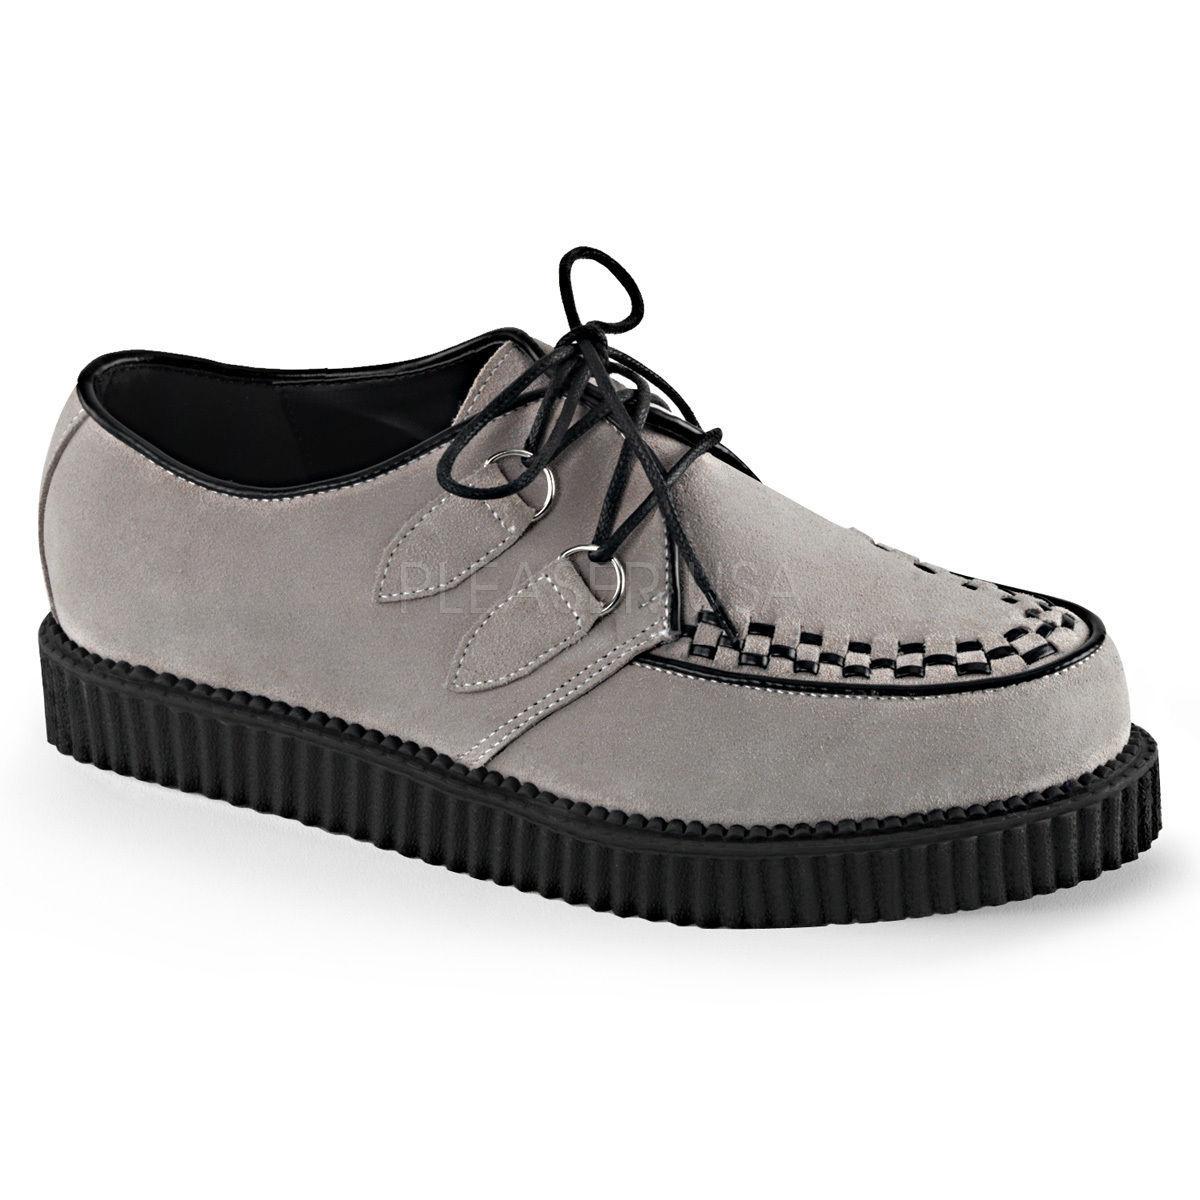 DEMONIA Mens Gothic Punk Platform Pointed Toe Creeper Black Oxford Leather Shoes